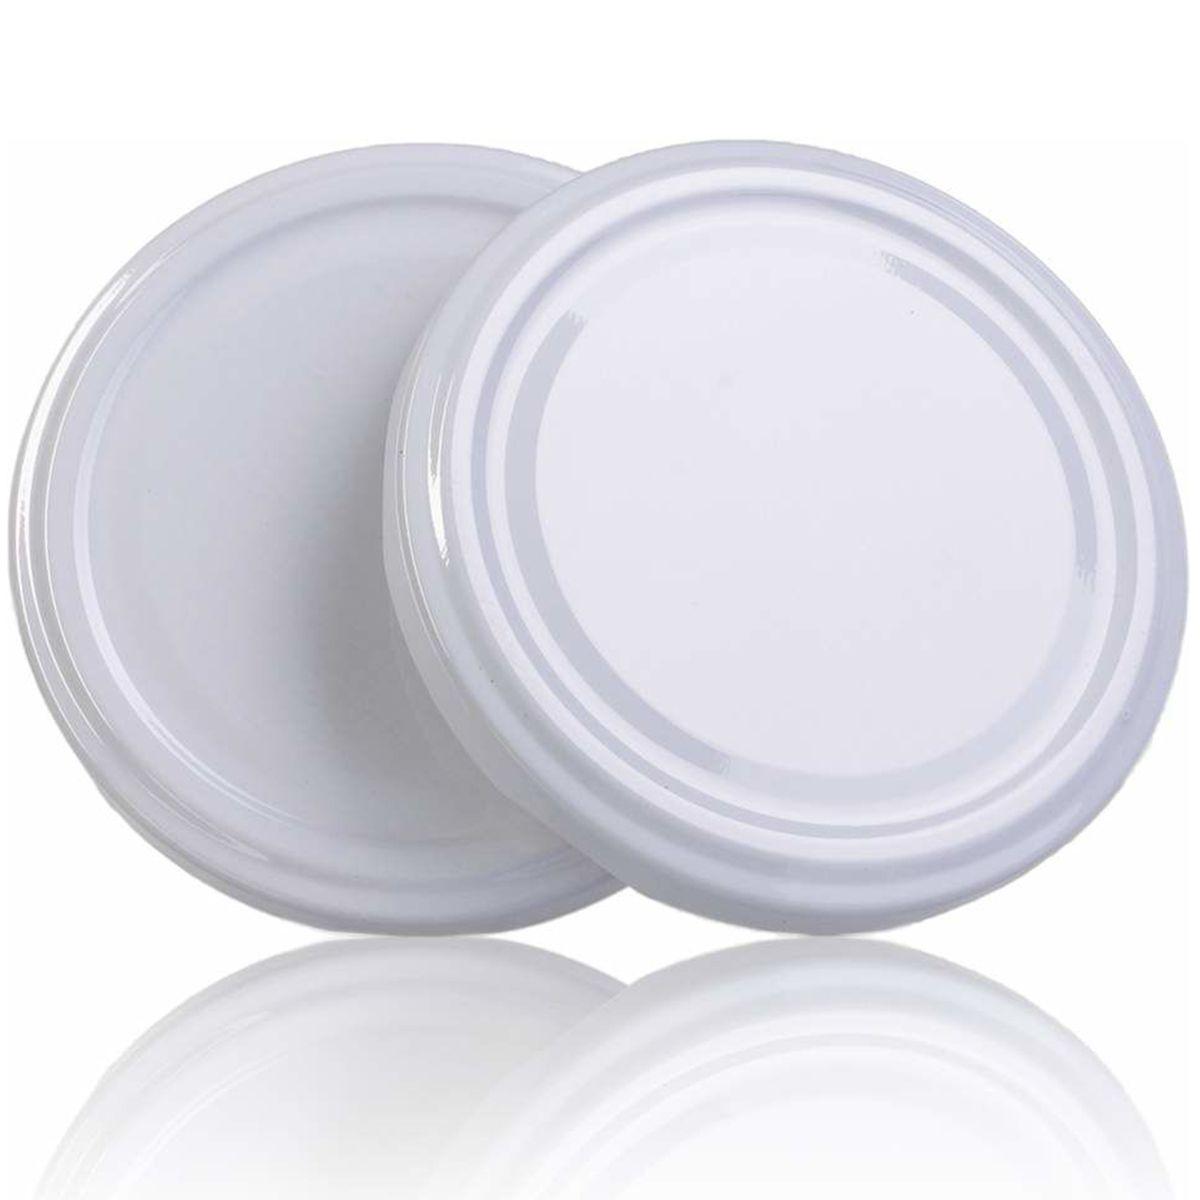 48 Potes De Vidro Mini Belém 150 Ml Tampa Branca + Lacre  - EMPÓRIO PACK